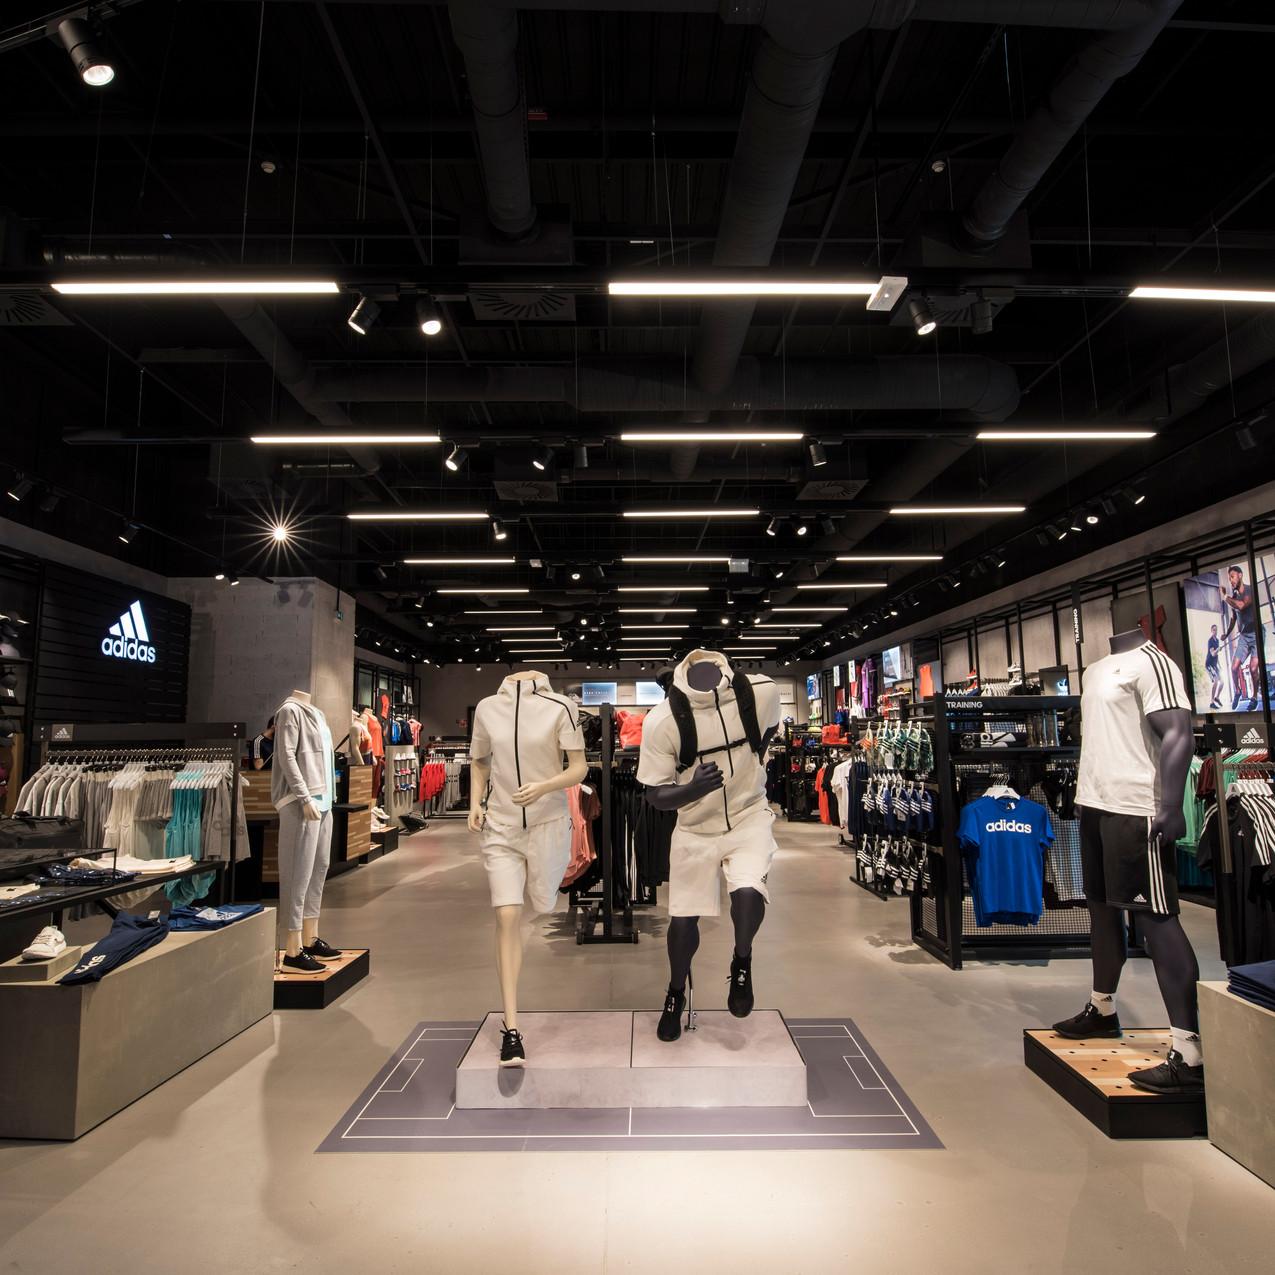 photographe architecture nice magasin adidas cap 3000